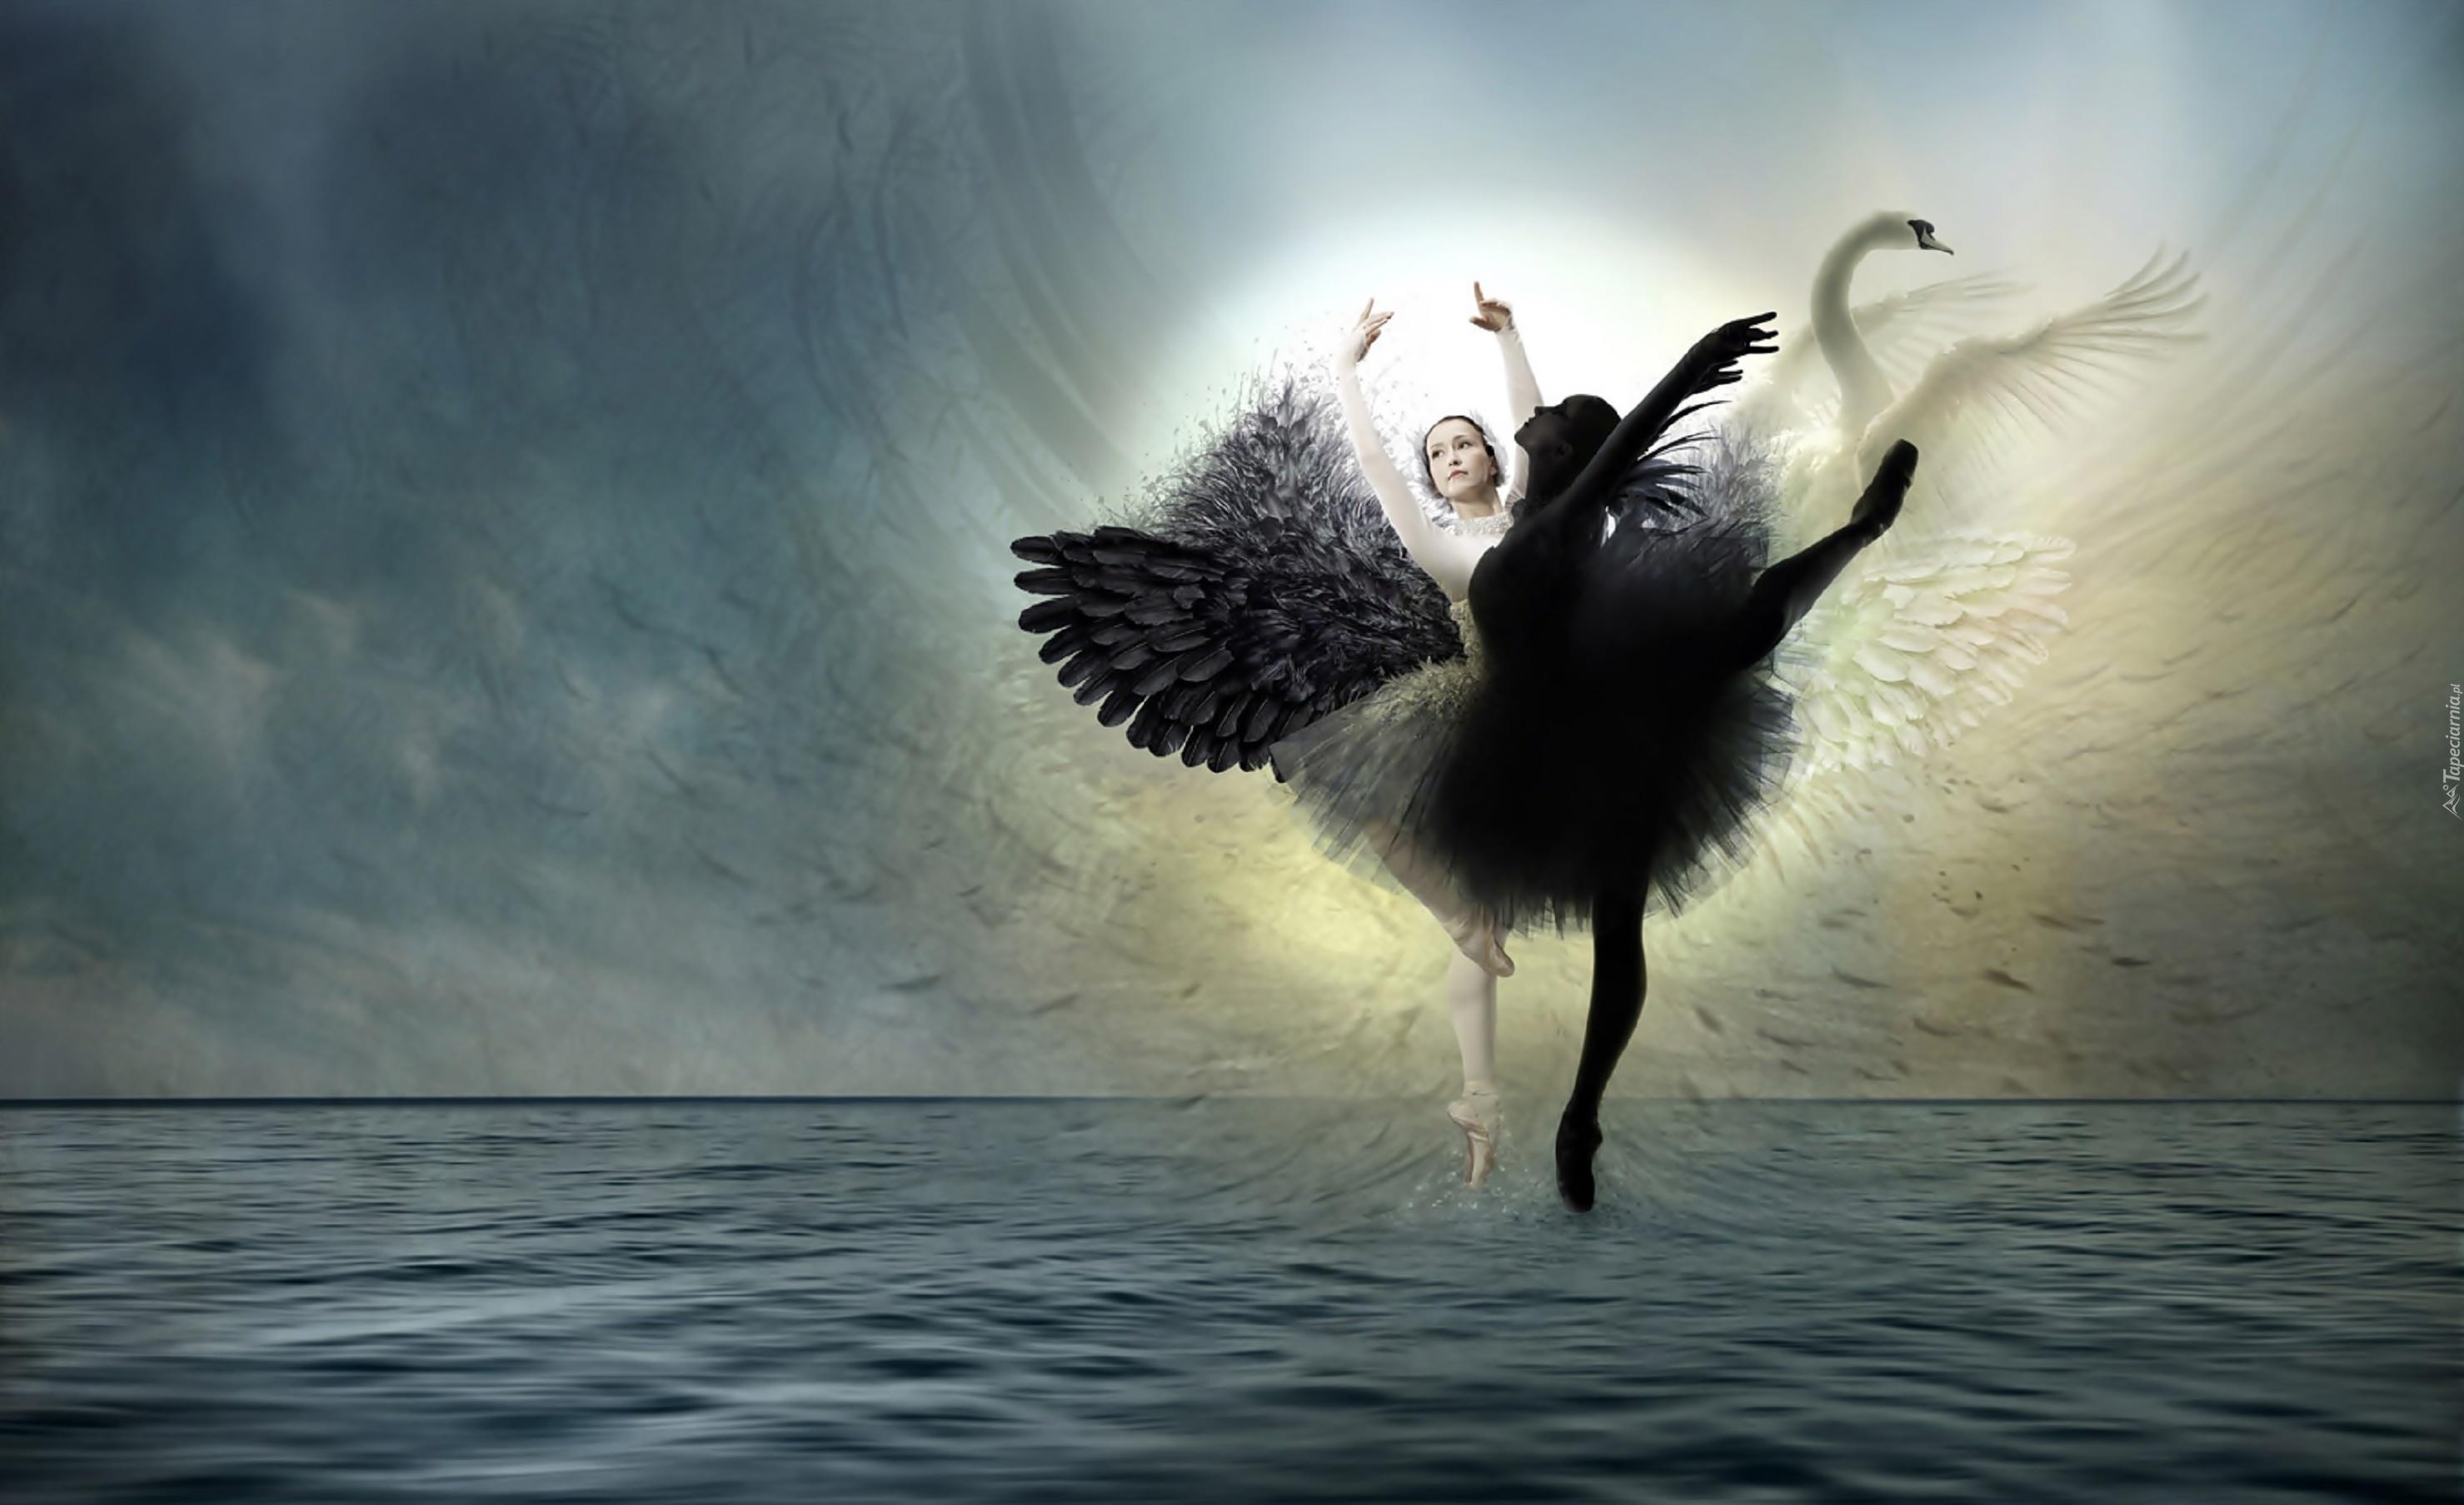 swan lake black single women (in the film black swan,  swan lake is generally  german singer jeanette biedermann uses the swan lake melody structure for her 2001 single release.